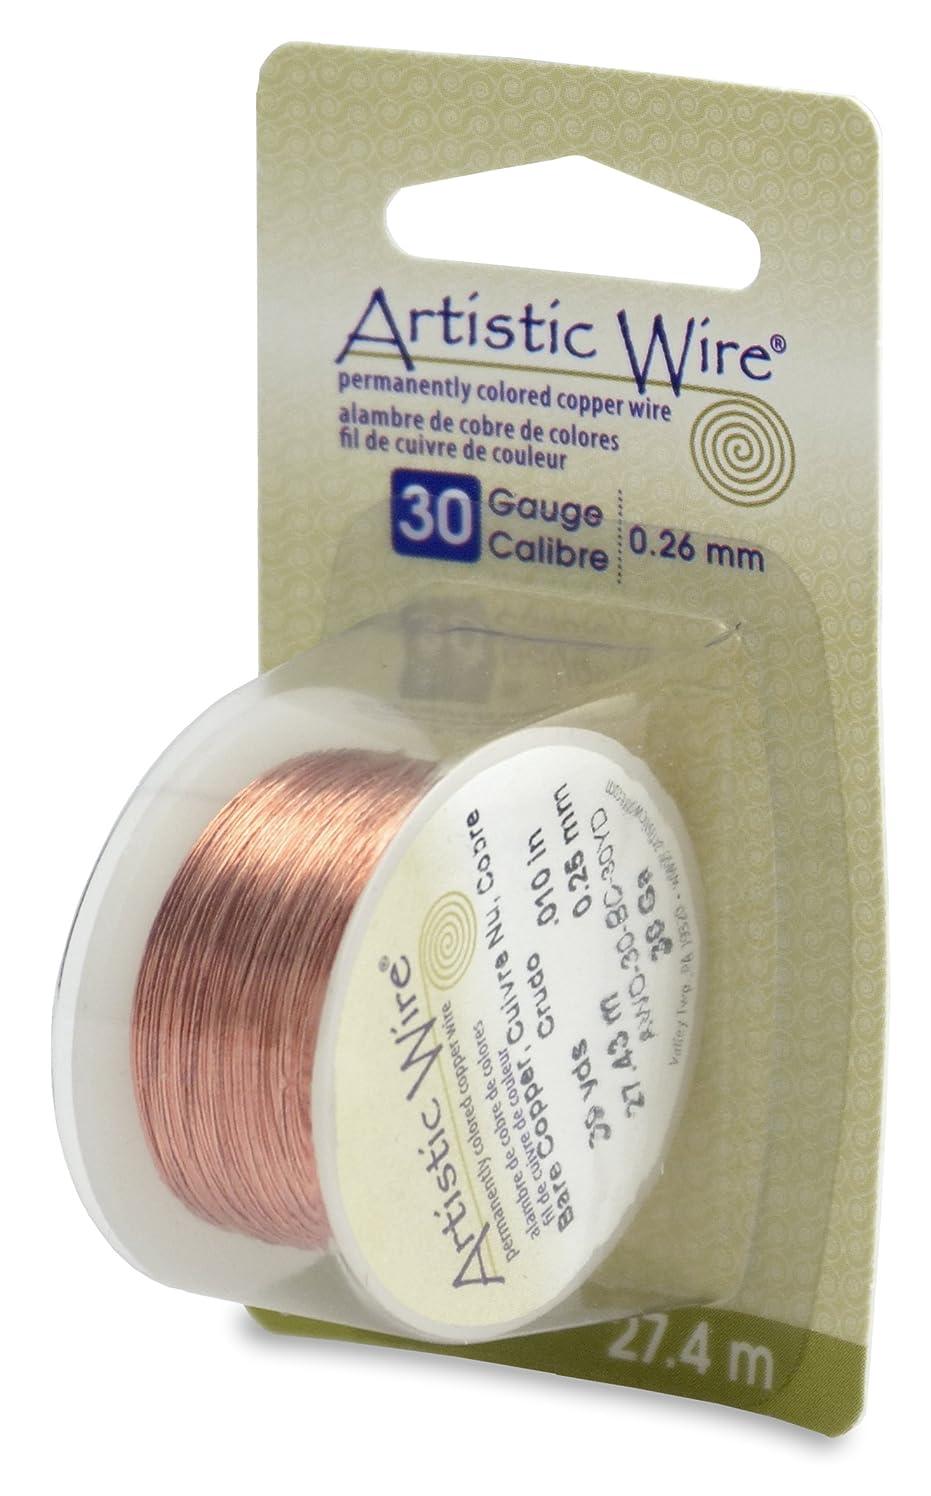 Beadalon Artistic, 30 Gauge, Bare Copper, 30 yd (27.4 m) Craft Wire,